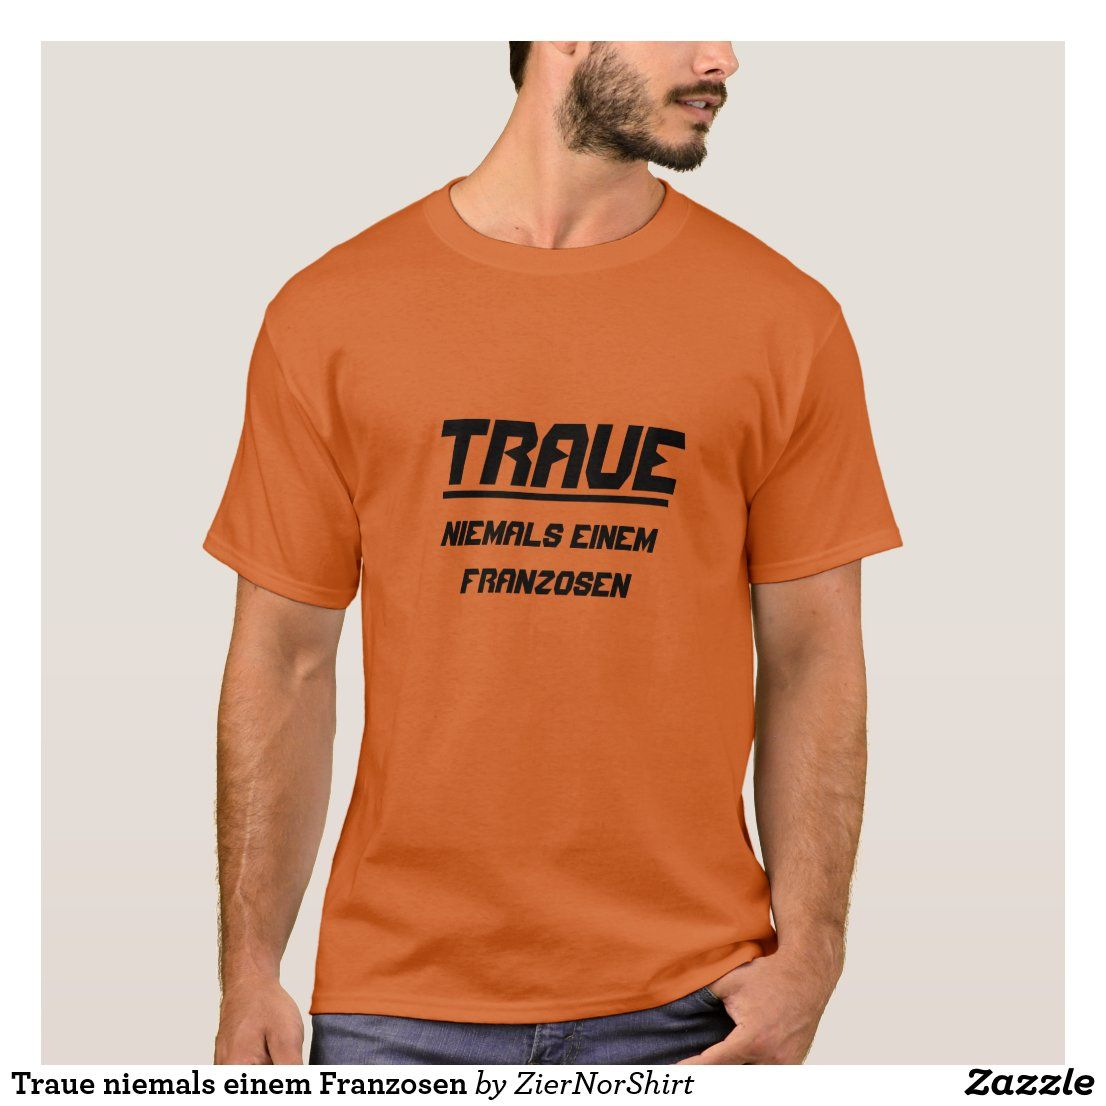 Traue niemals einem Franzosen T-Shirt  trendy unique t-shirt fashion design clothes. Cool t-shirt, funny t-shirt